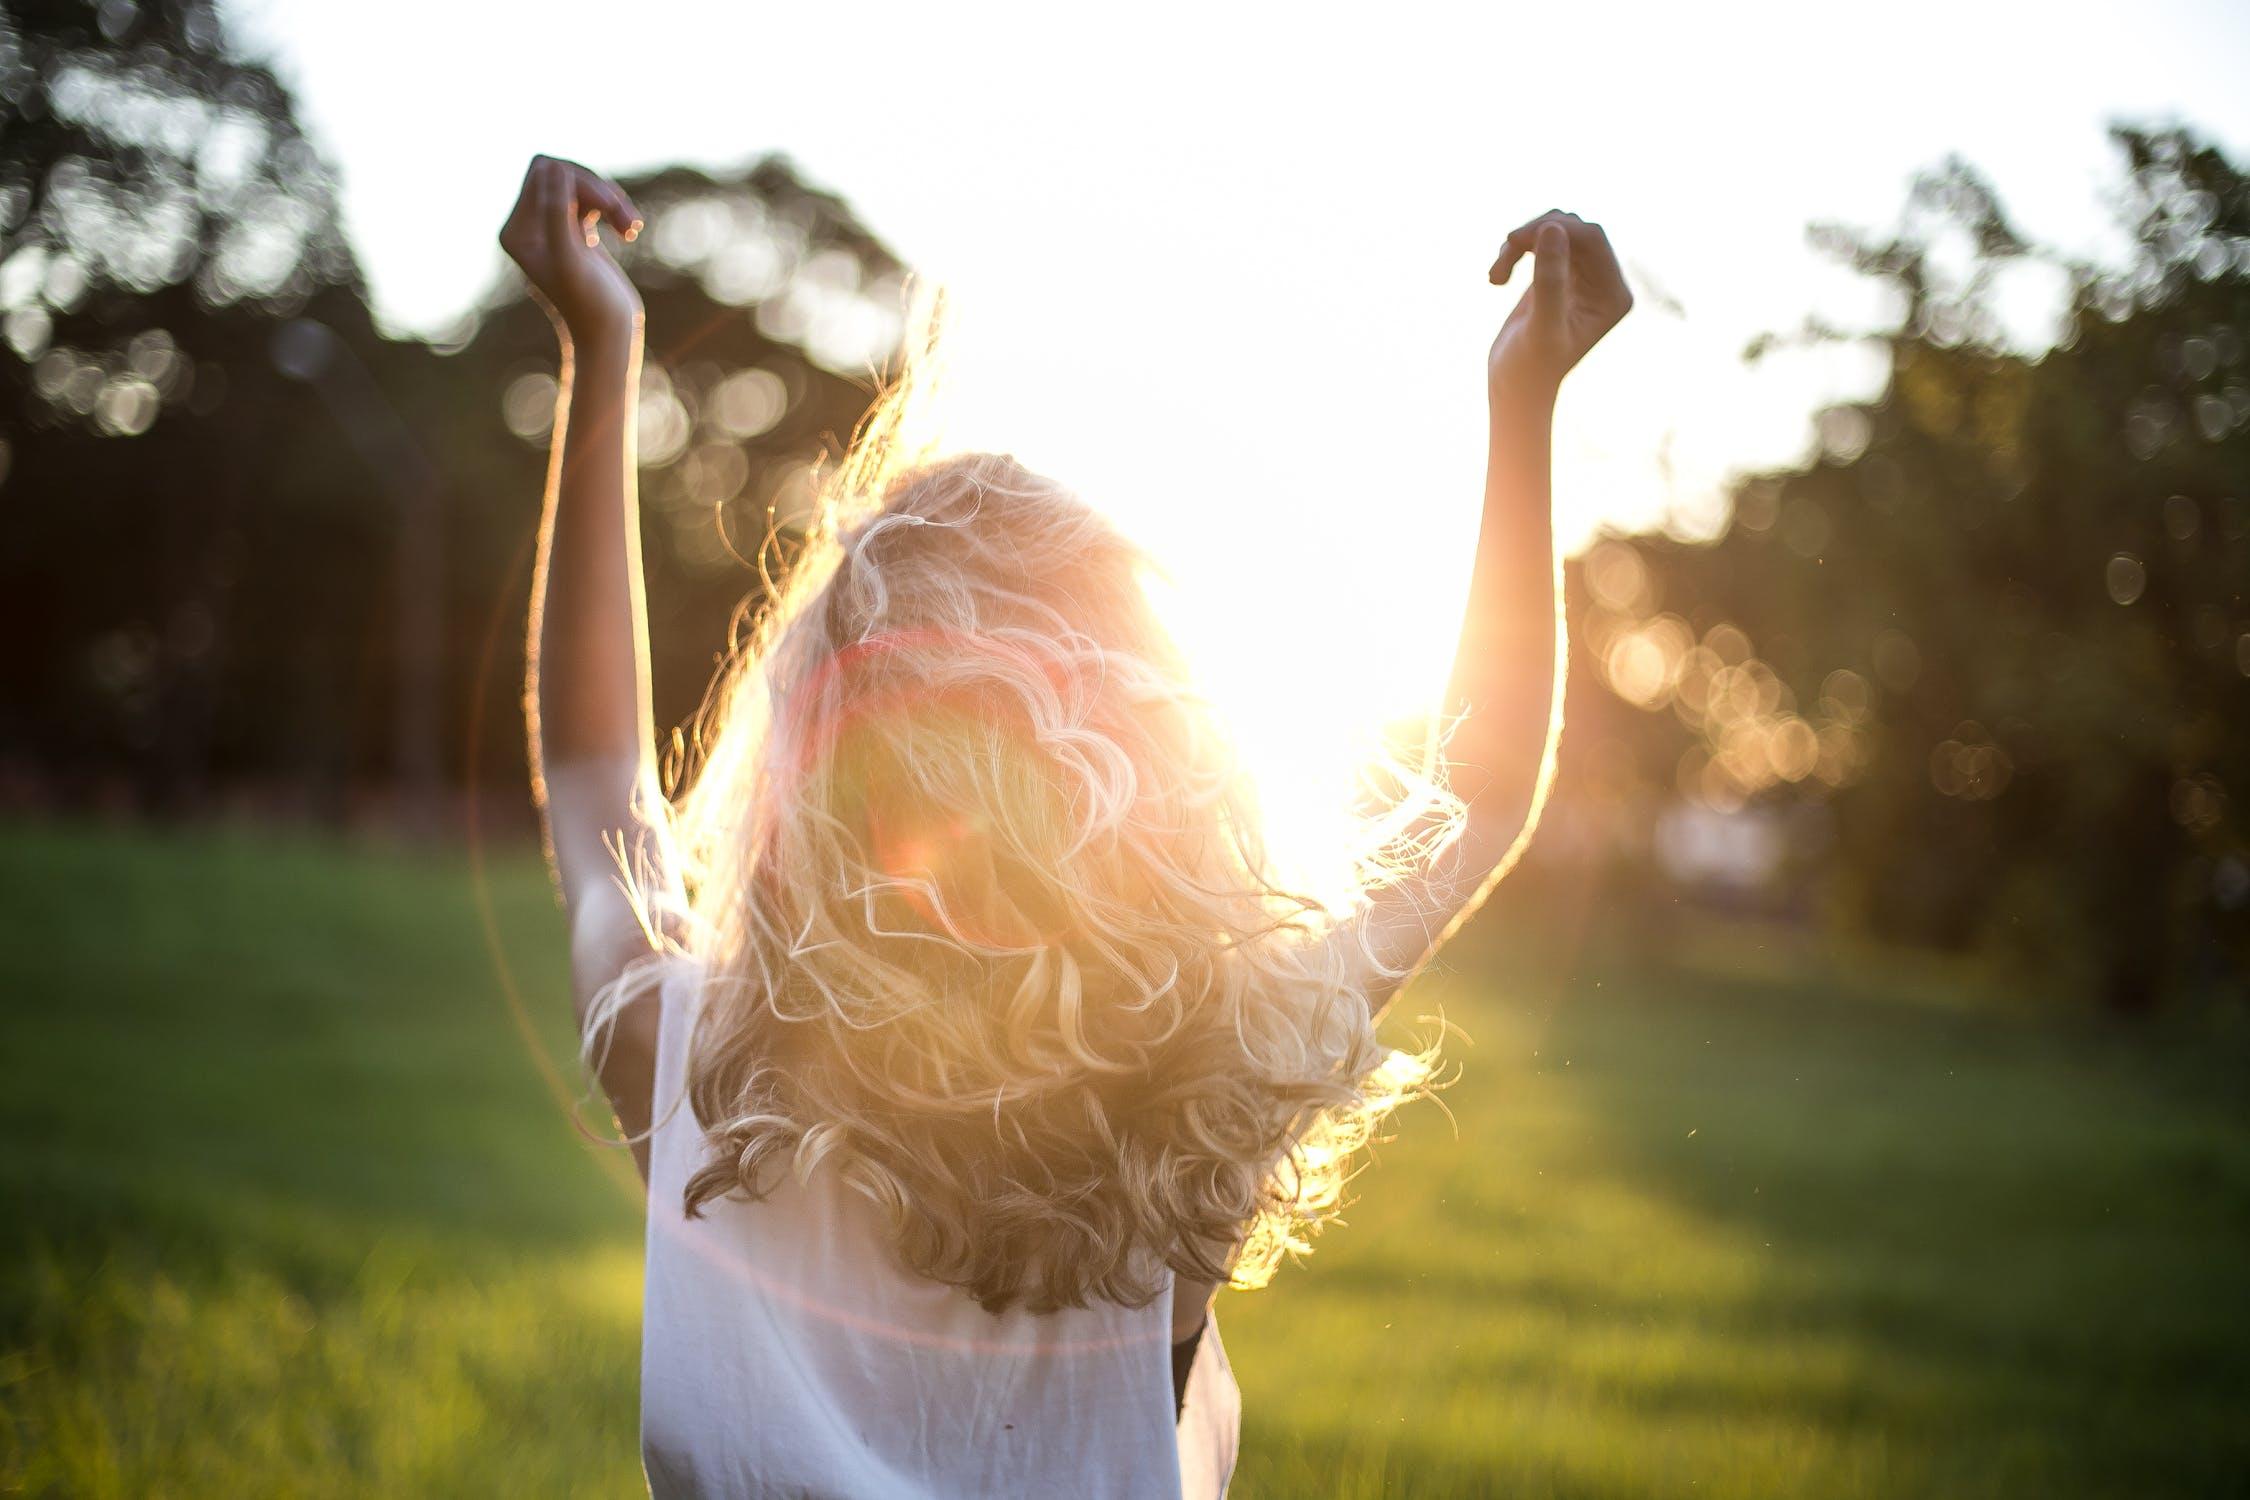 woman sunshine happy joy